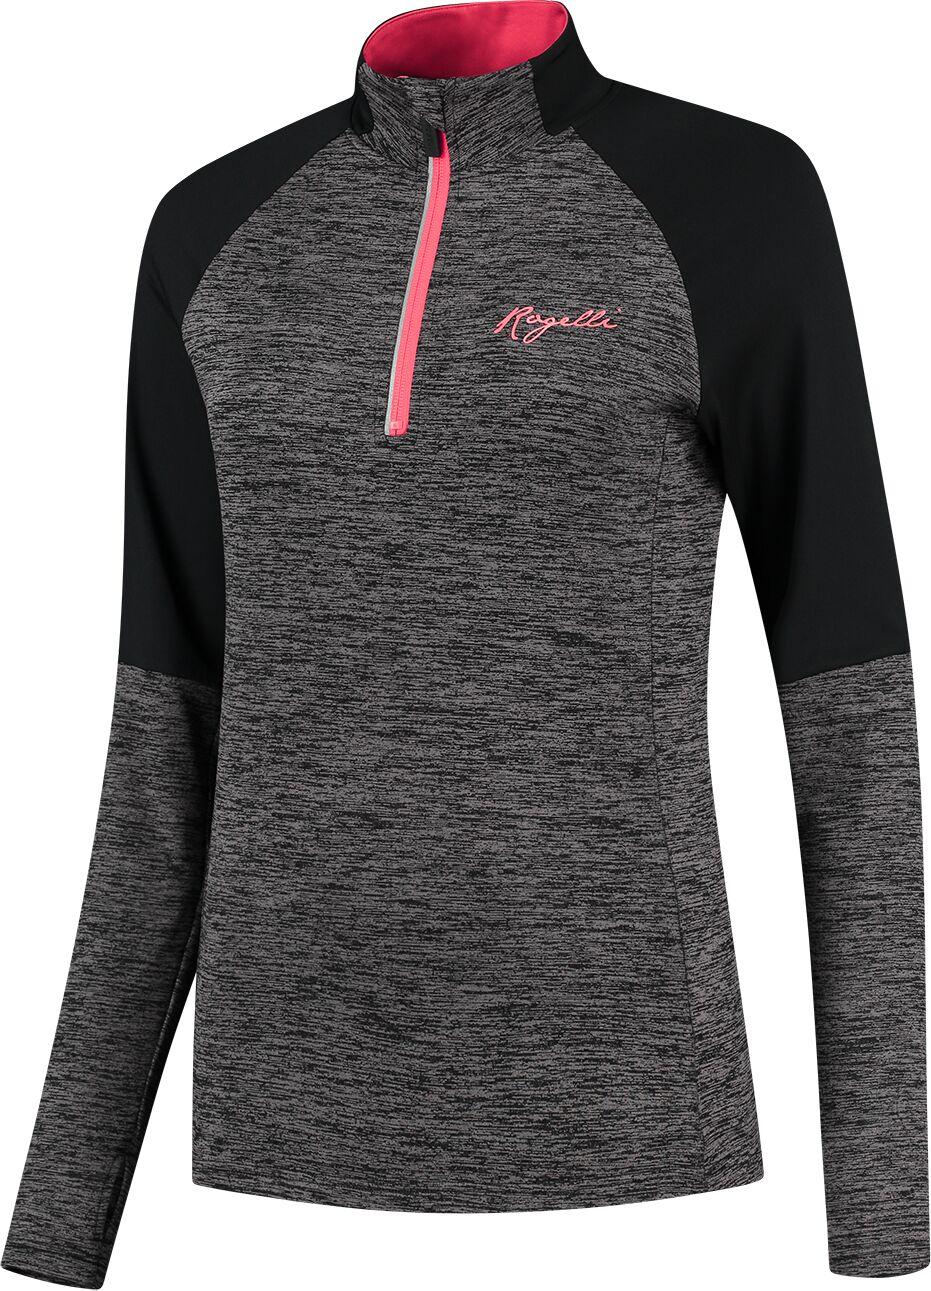 ROGELLI bluza do biegania damska ENJOY grey ROG351109 Rozmiar: M,ROG351109.XS